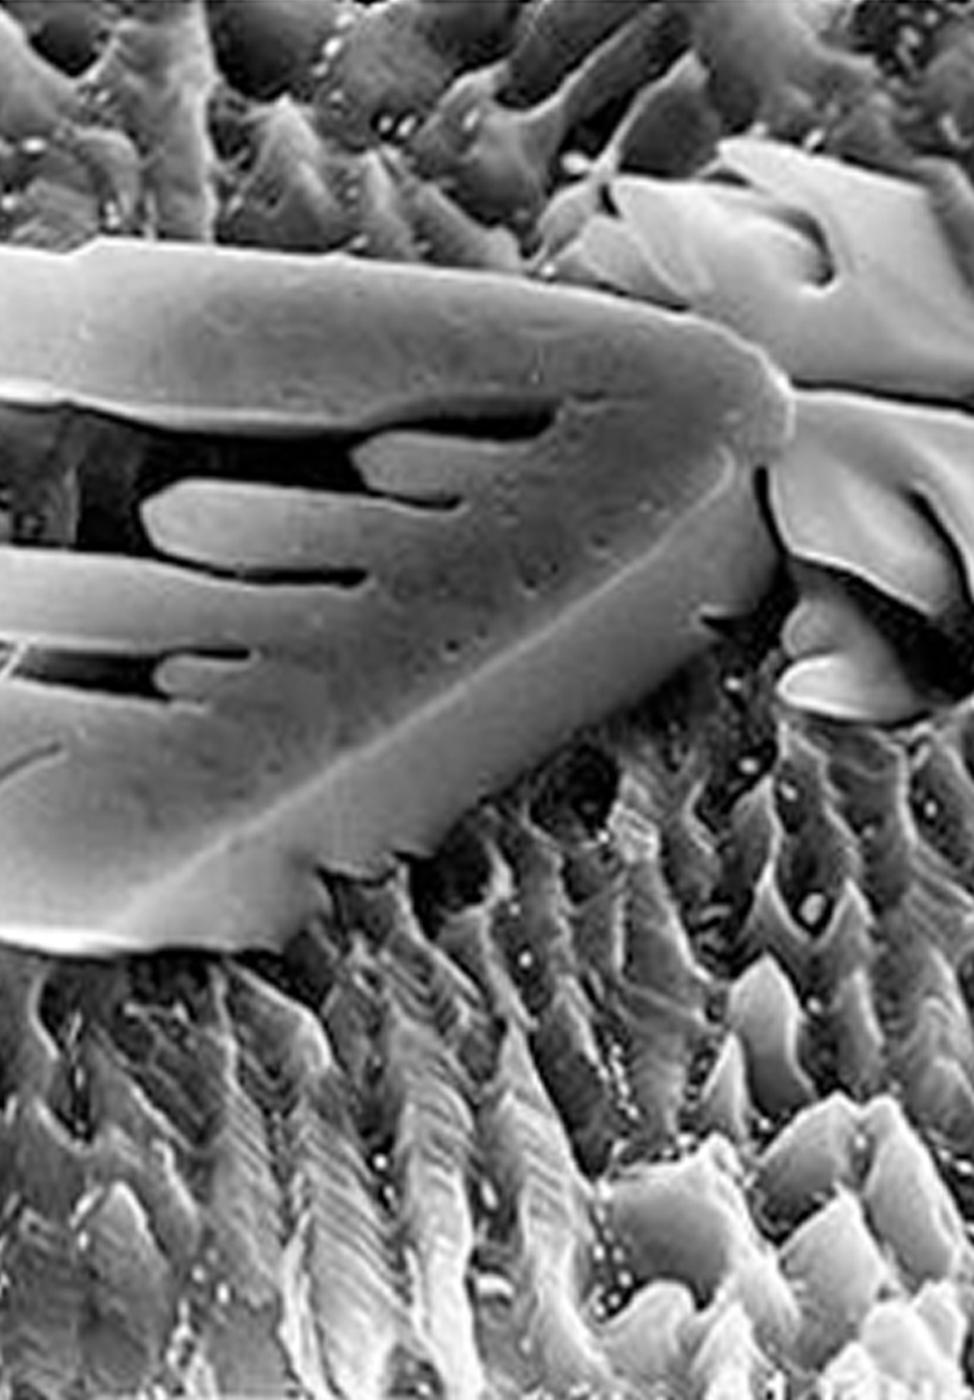 Scanning electron Microscopy